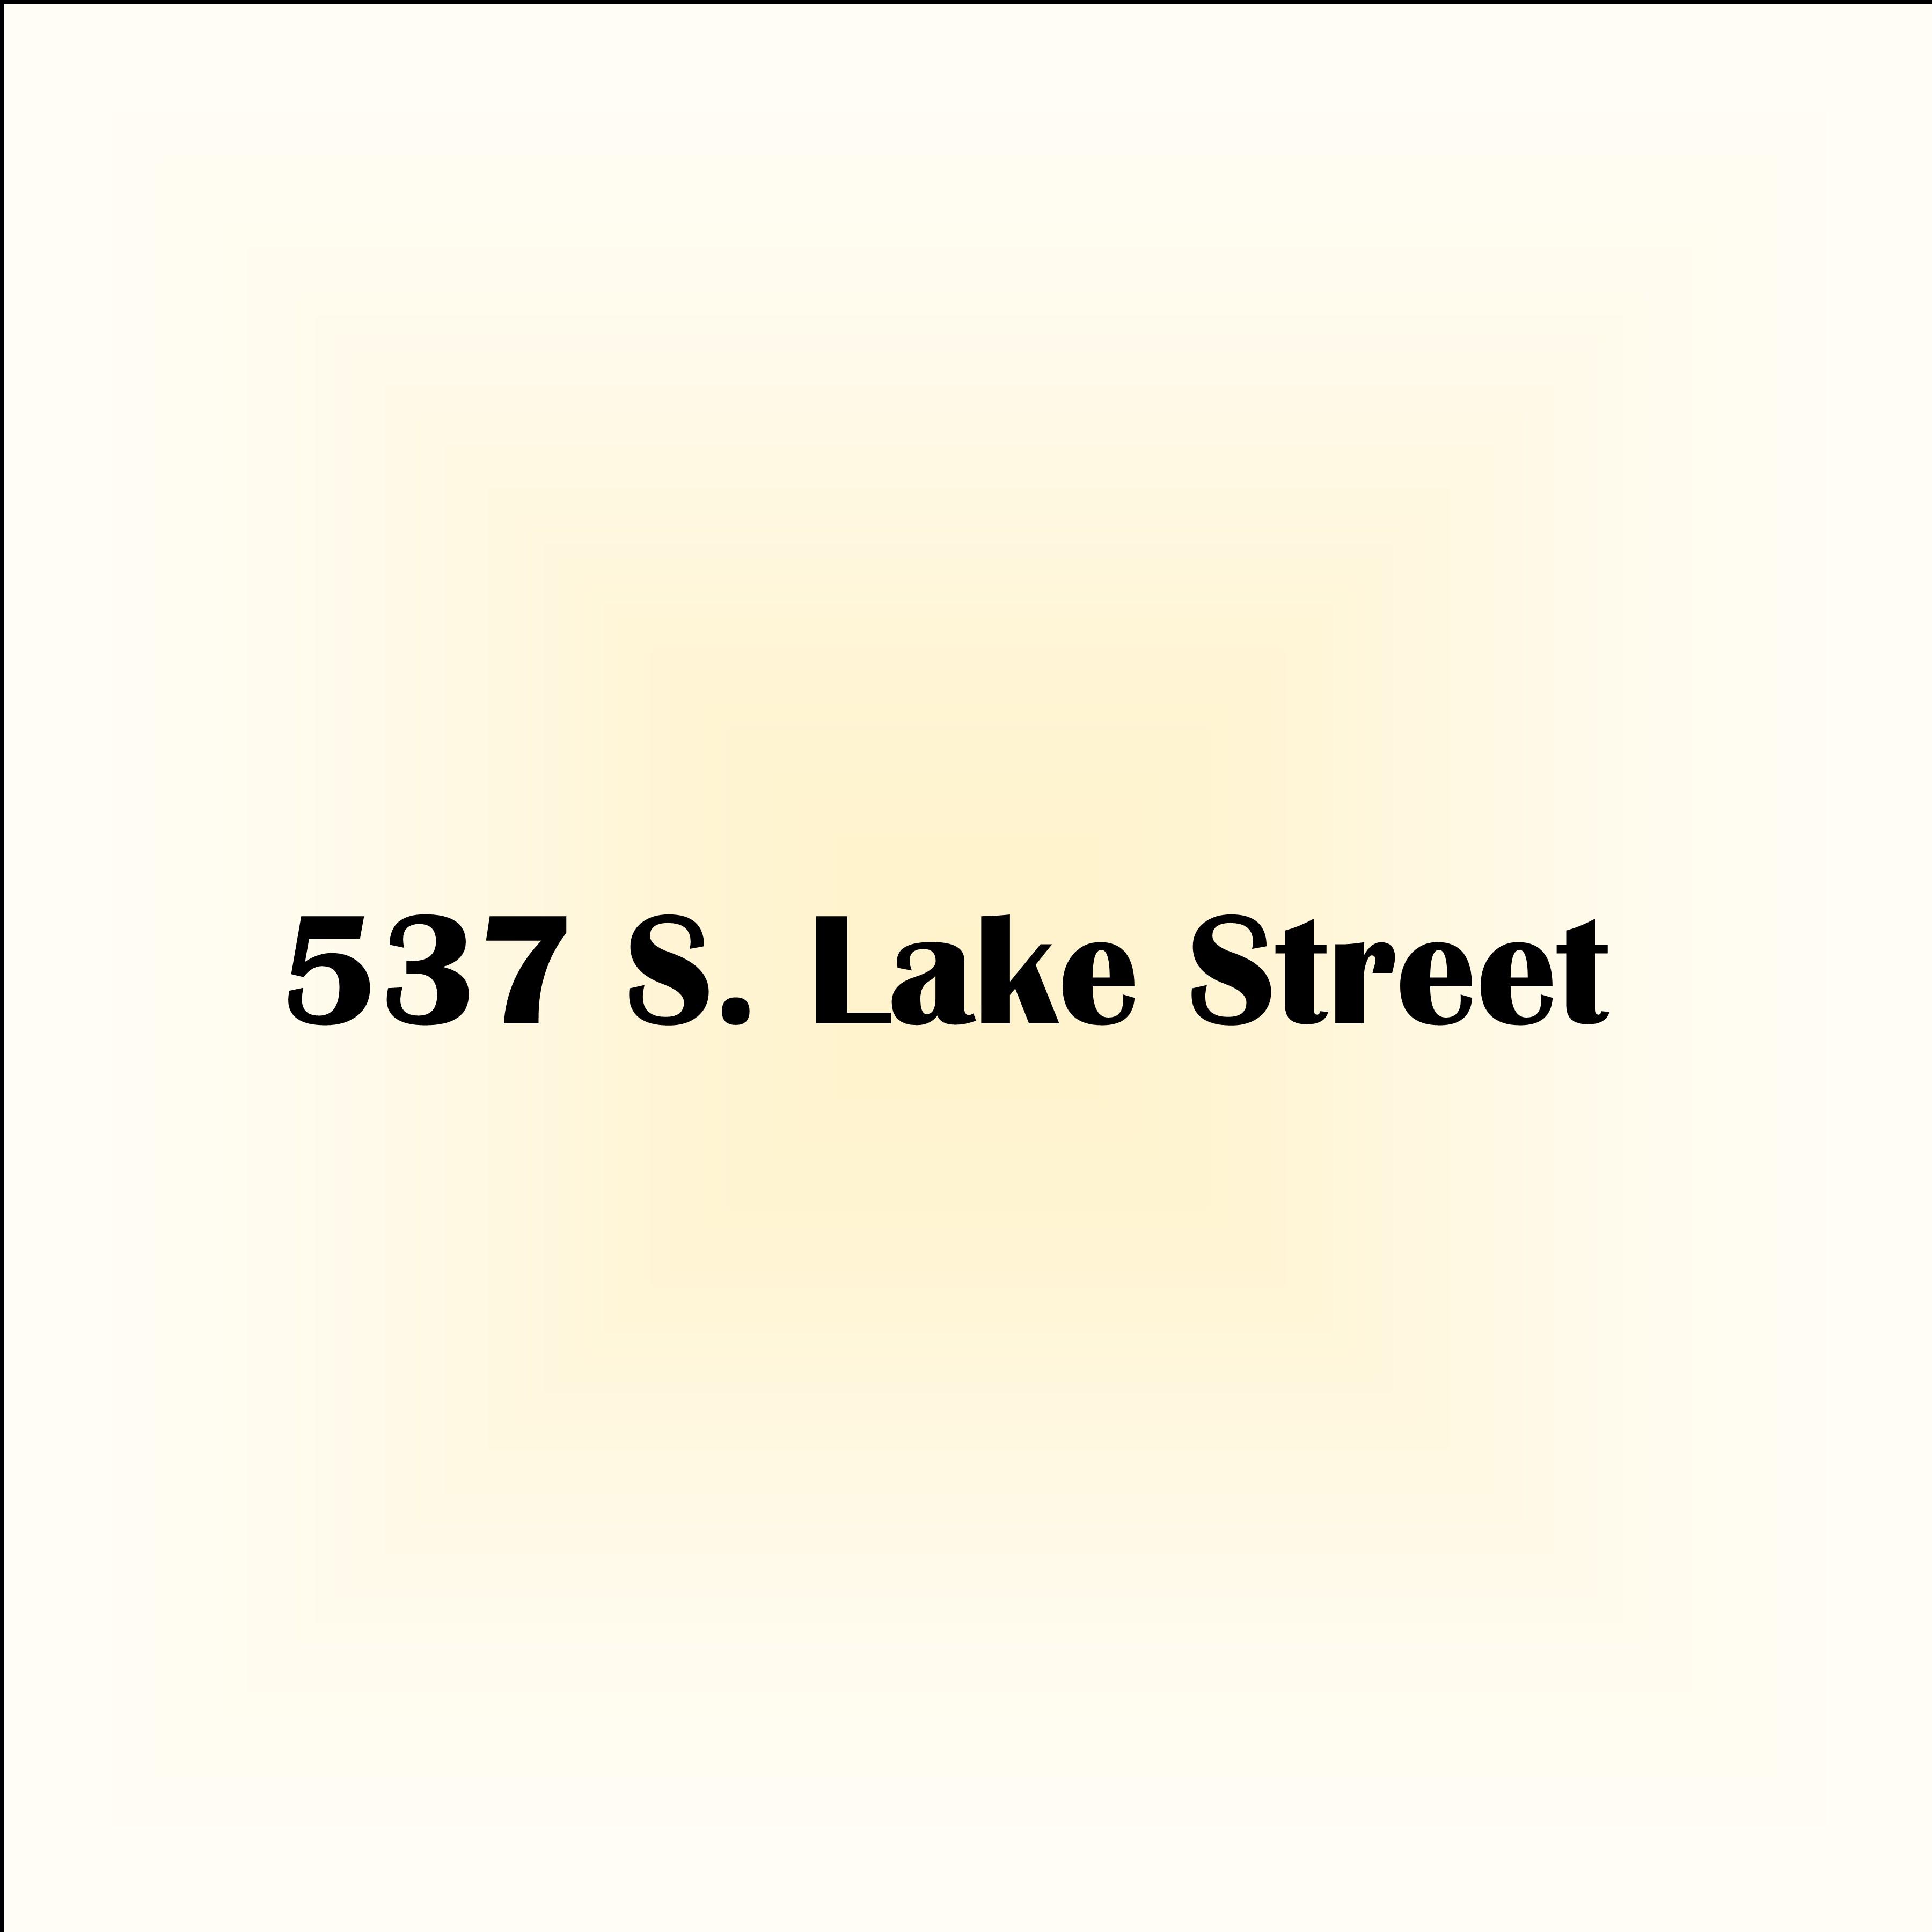 (219) 938-1919